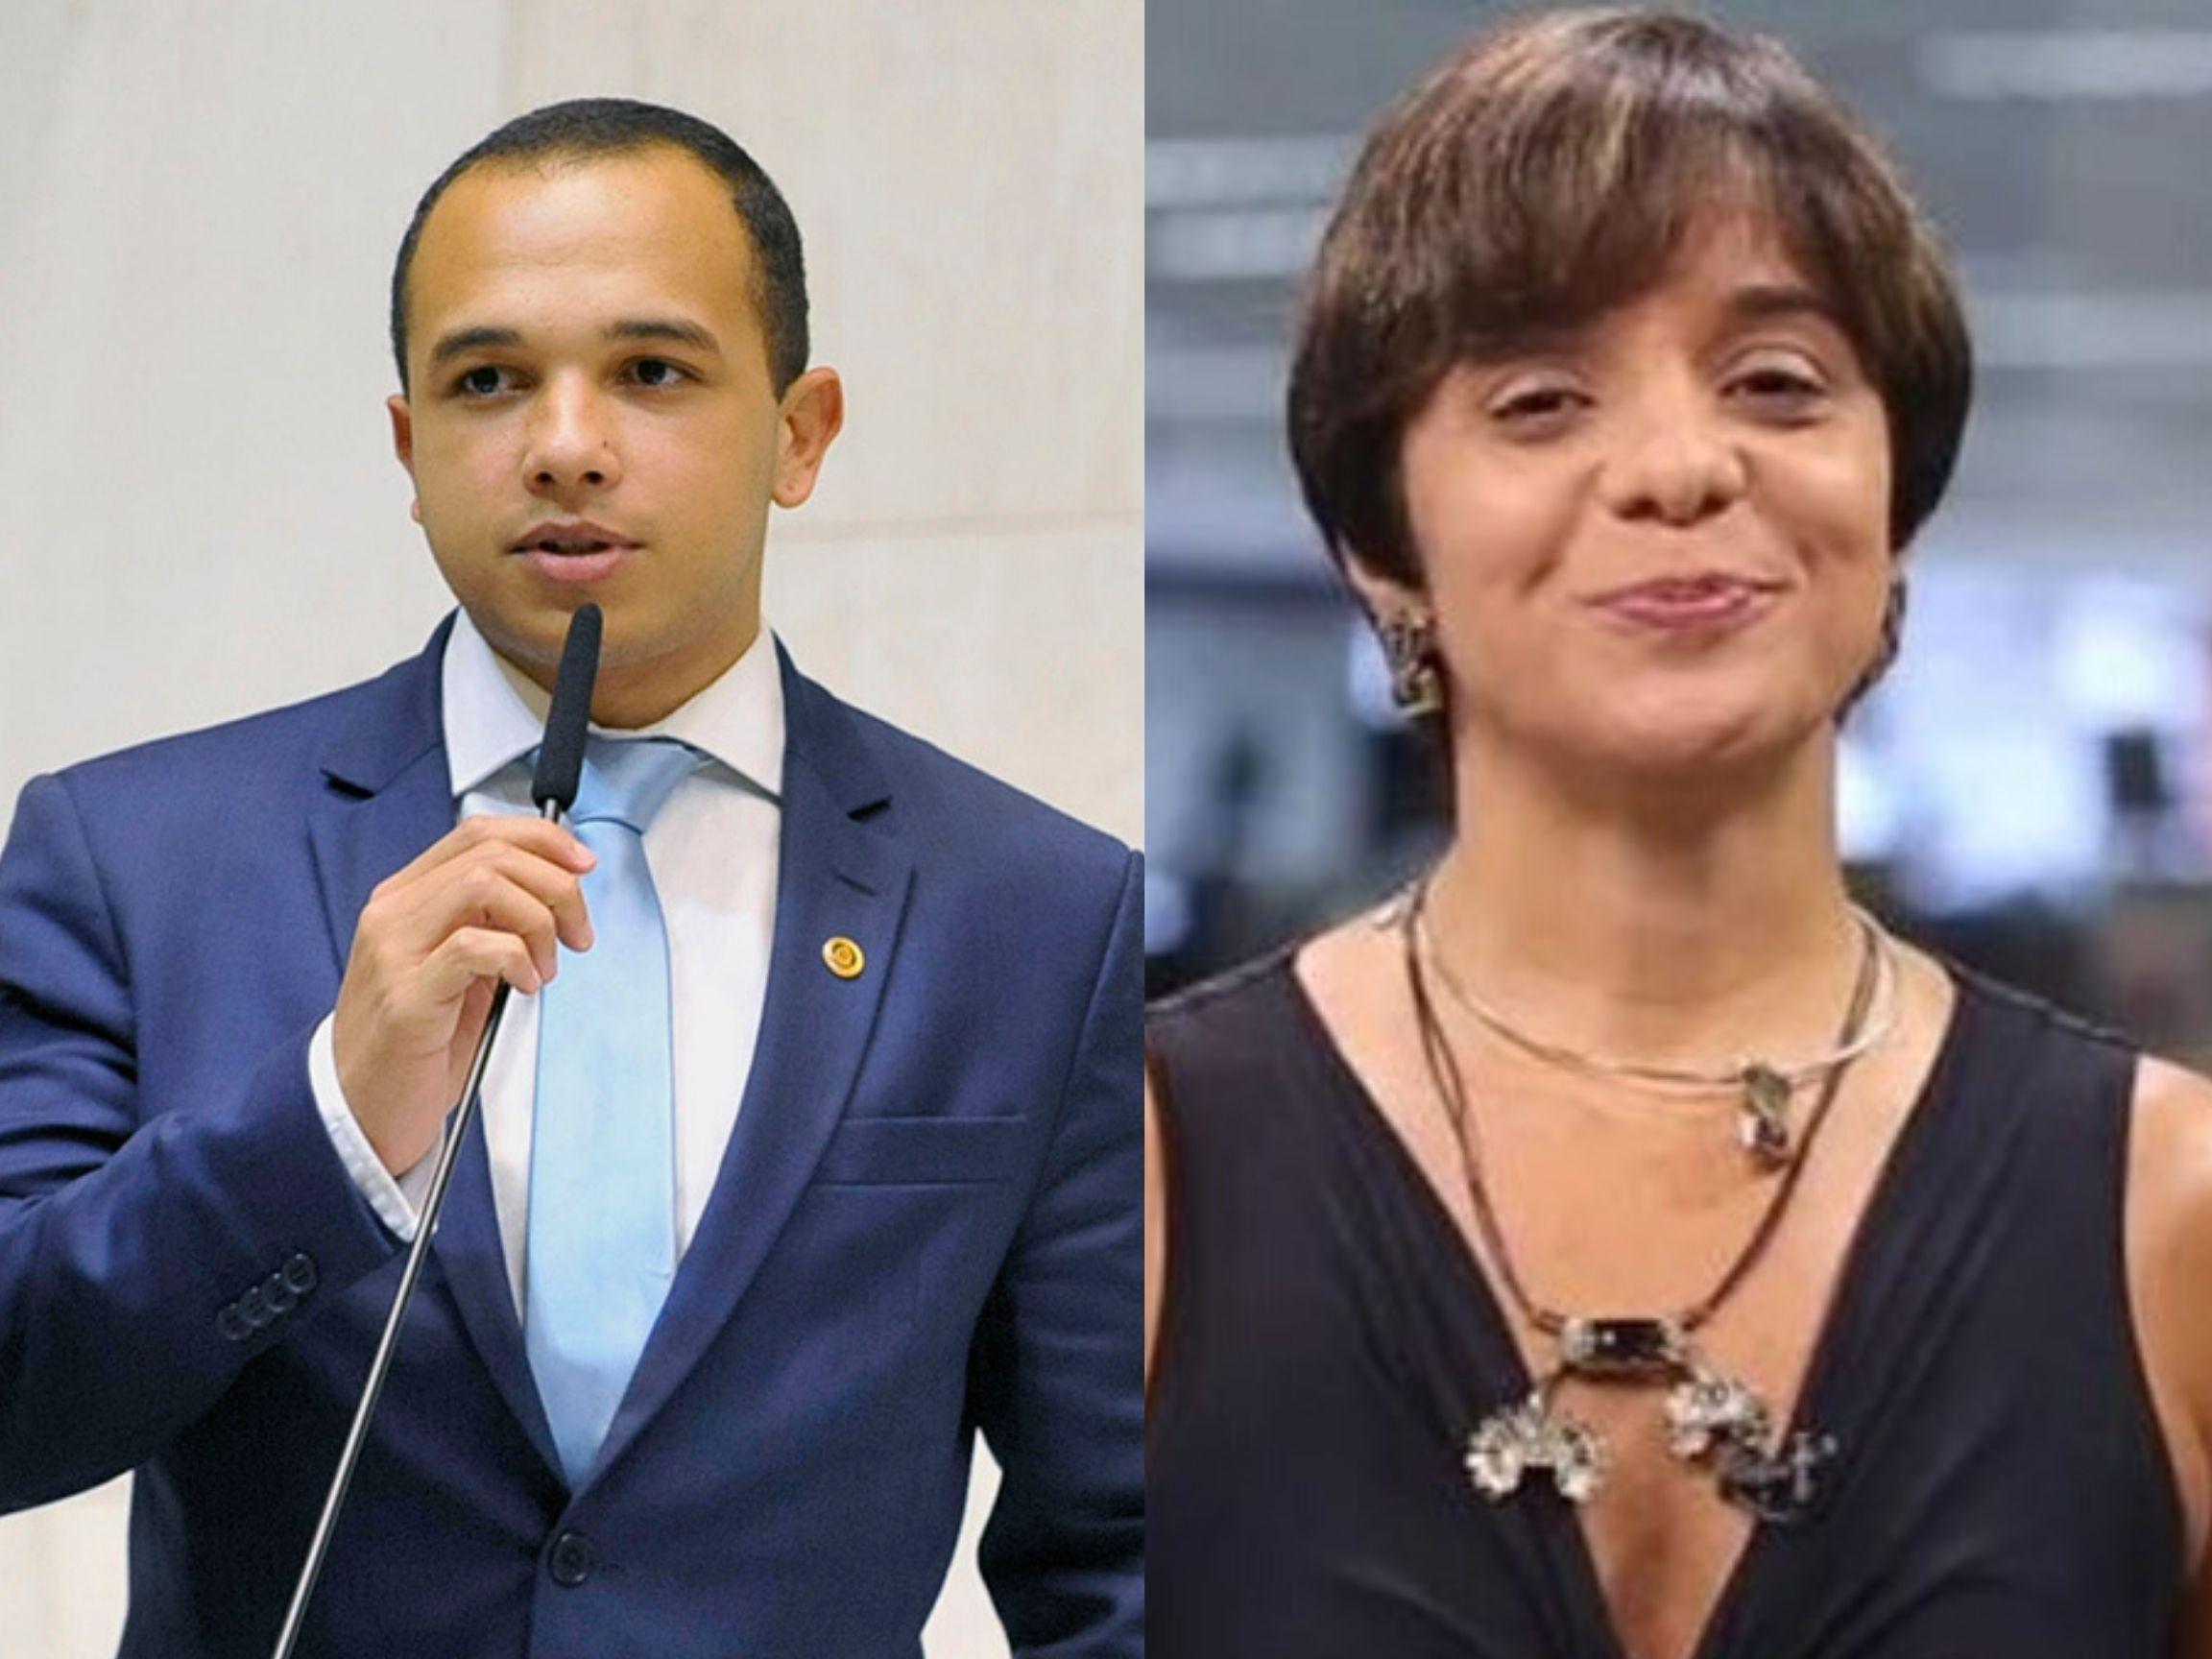 Jornalista recebe 500 mil por mês para falar mal de Bolsonaro, denuncia deputado